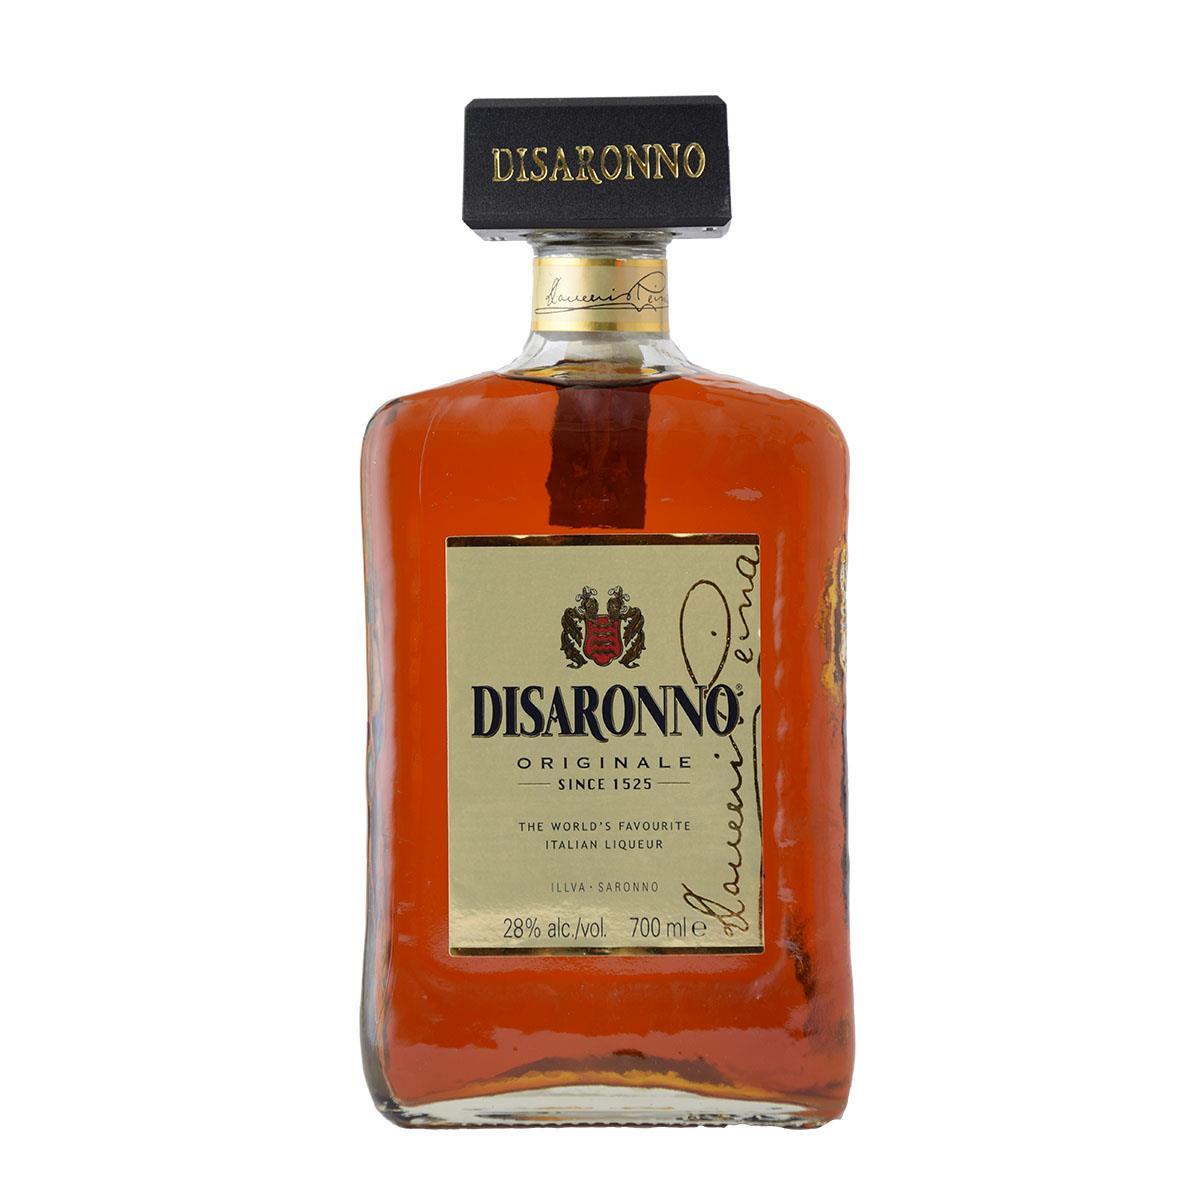 Disaronno Originale Liqueur 700ml